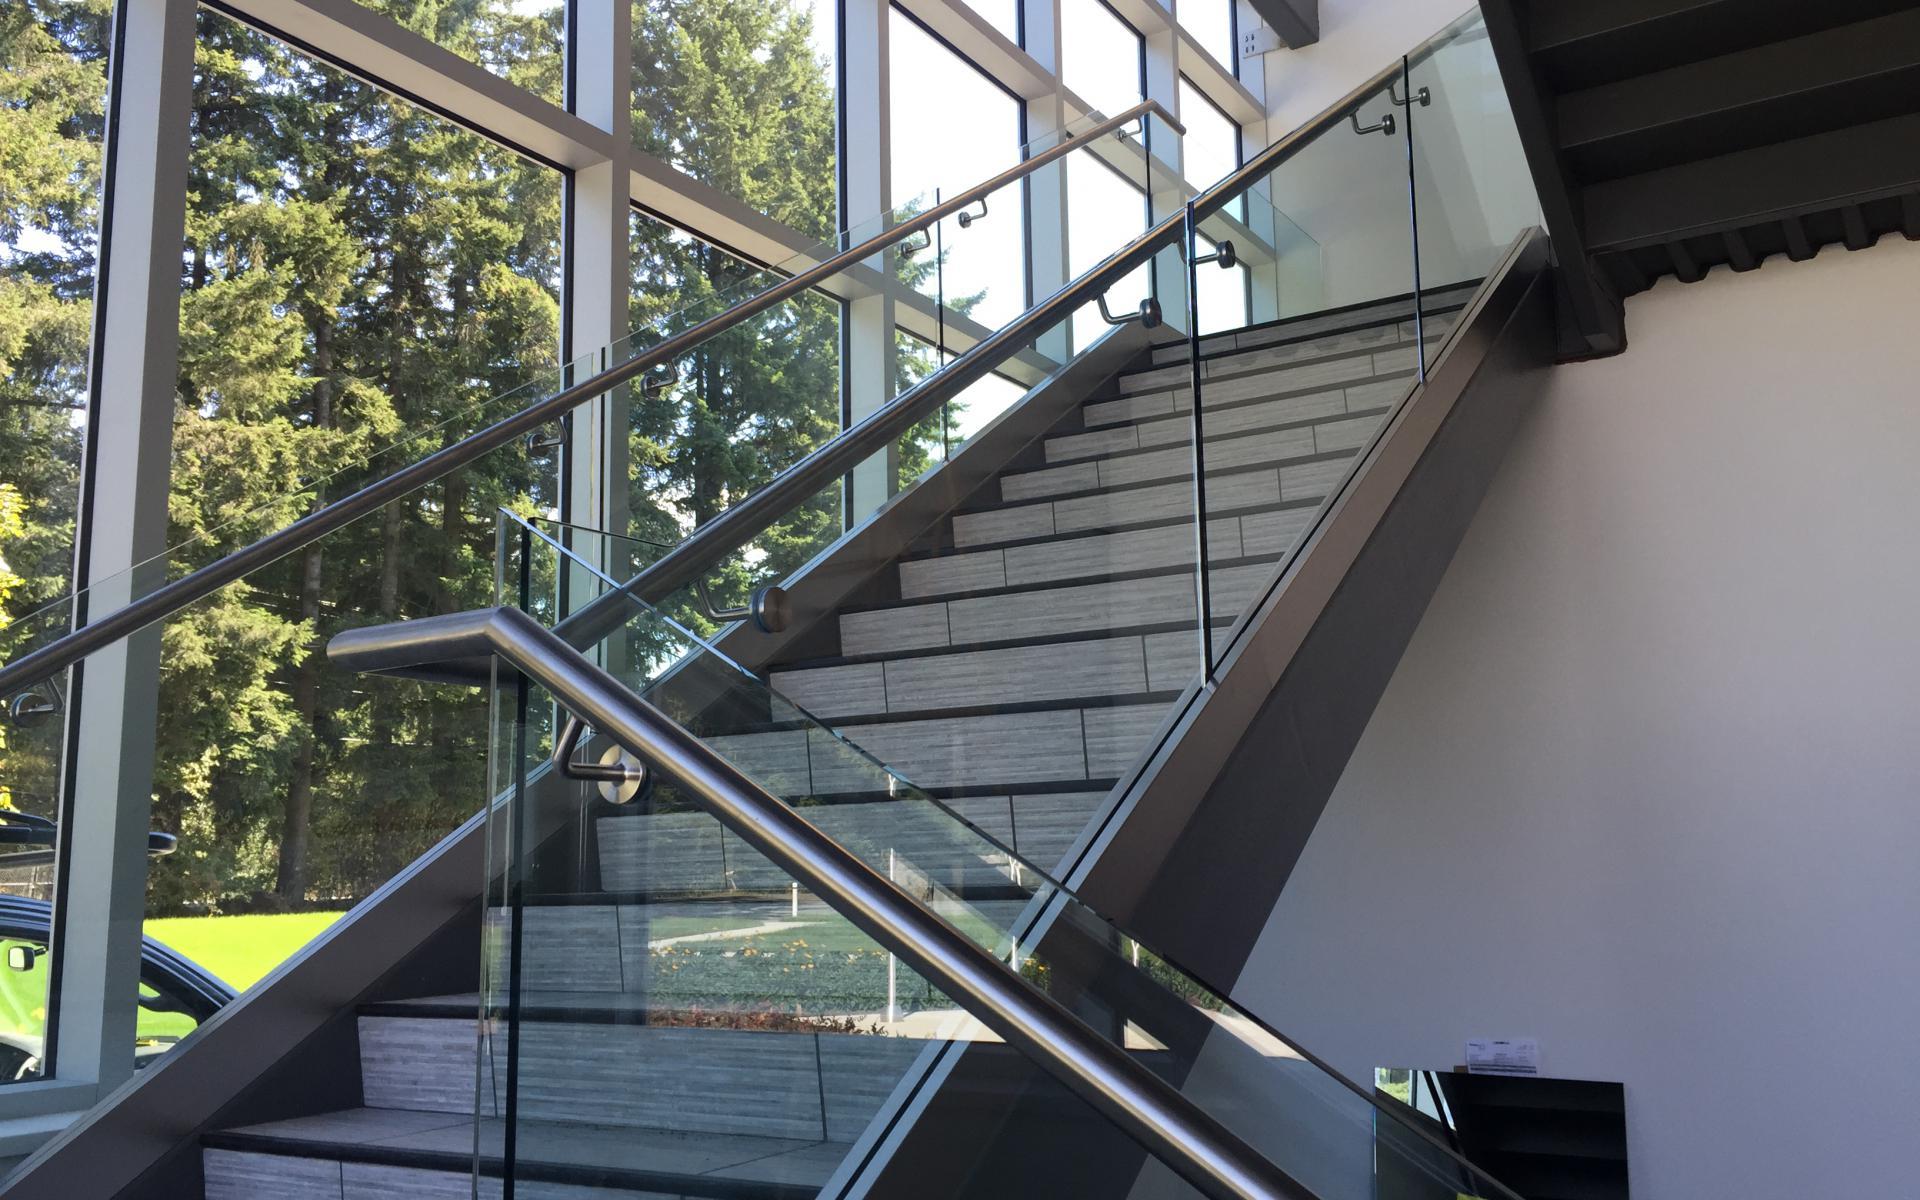 Vancouver interior frameless glass stair railings for Interior glass railing designs